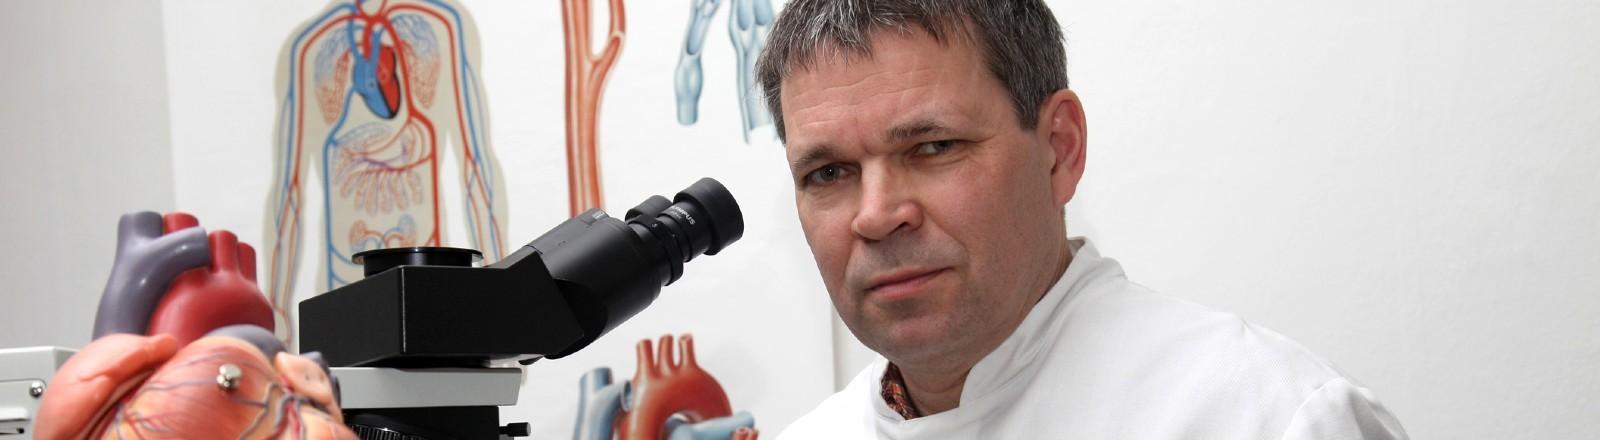 Professor Dr. med. Fred Zack, Institut für Rechtsmedizin in Rostock